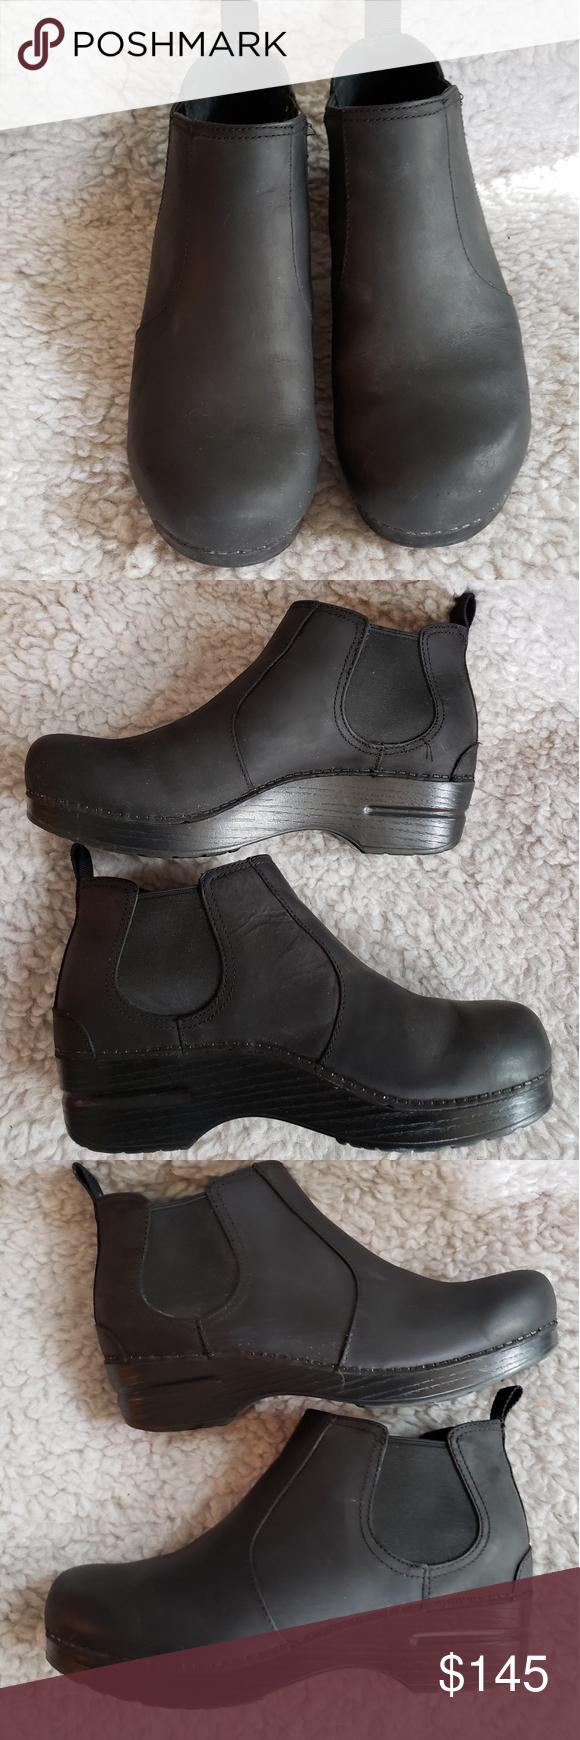 Dansko Frankie Black Oiled Ankle Boot